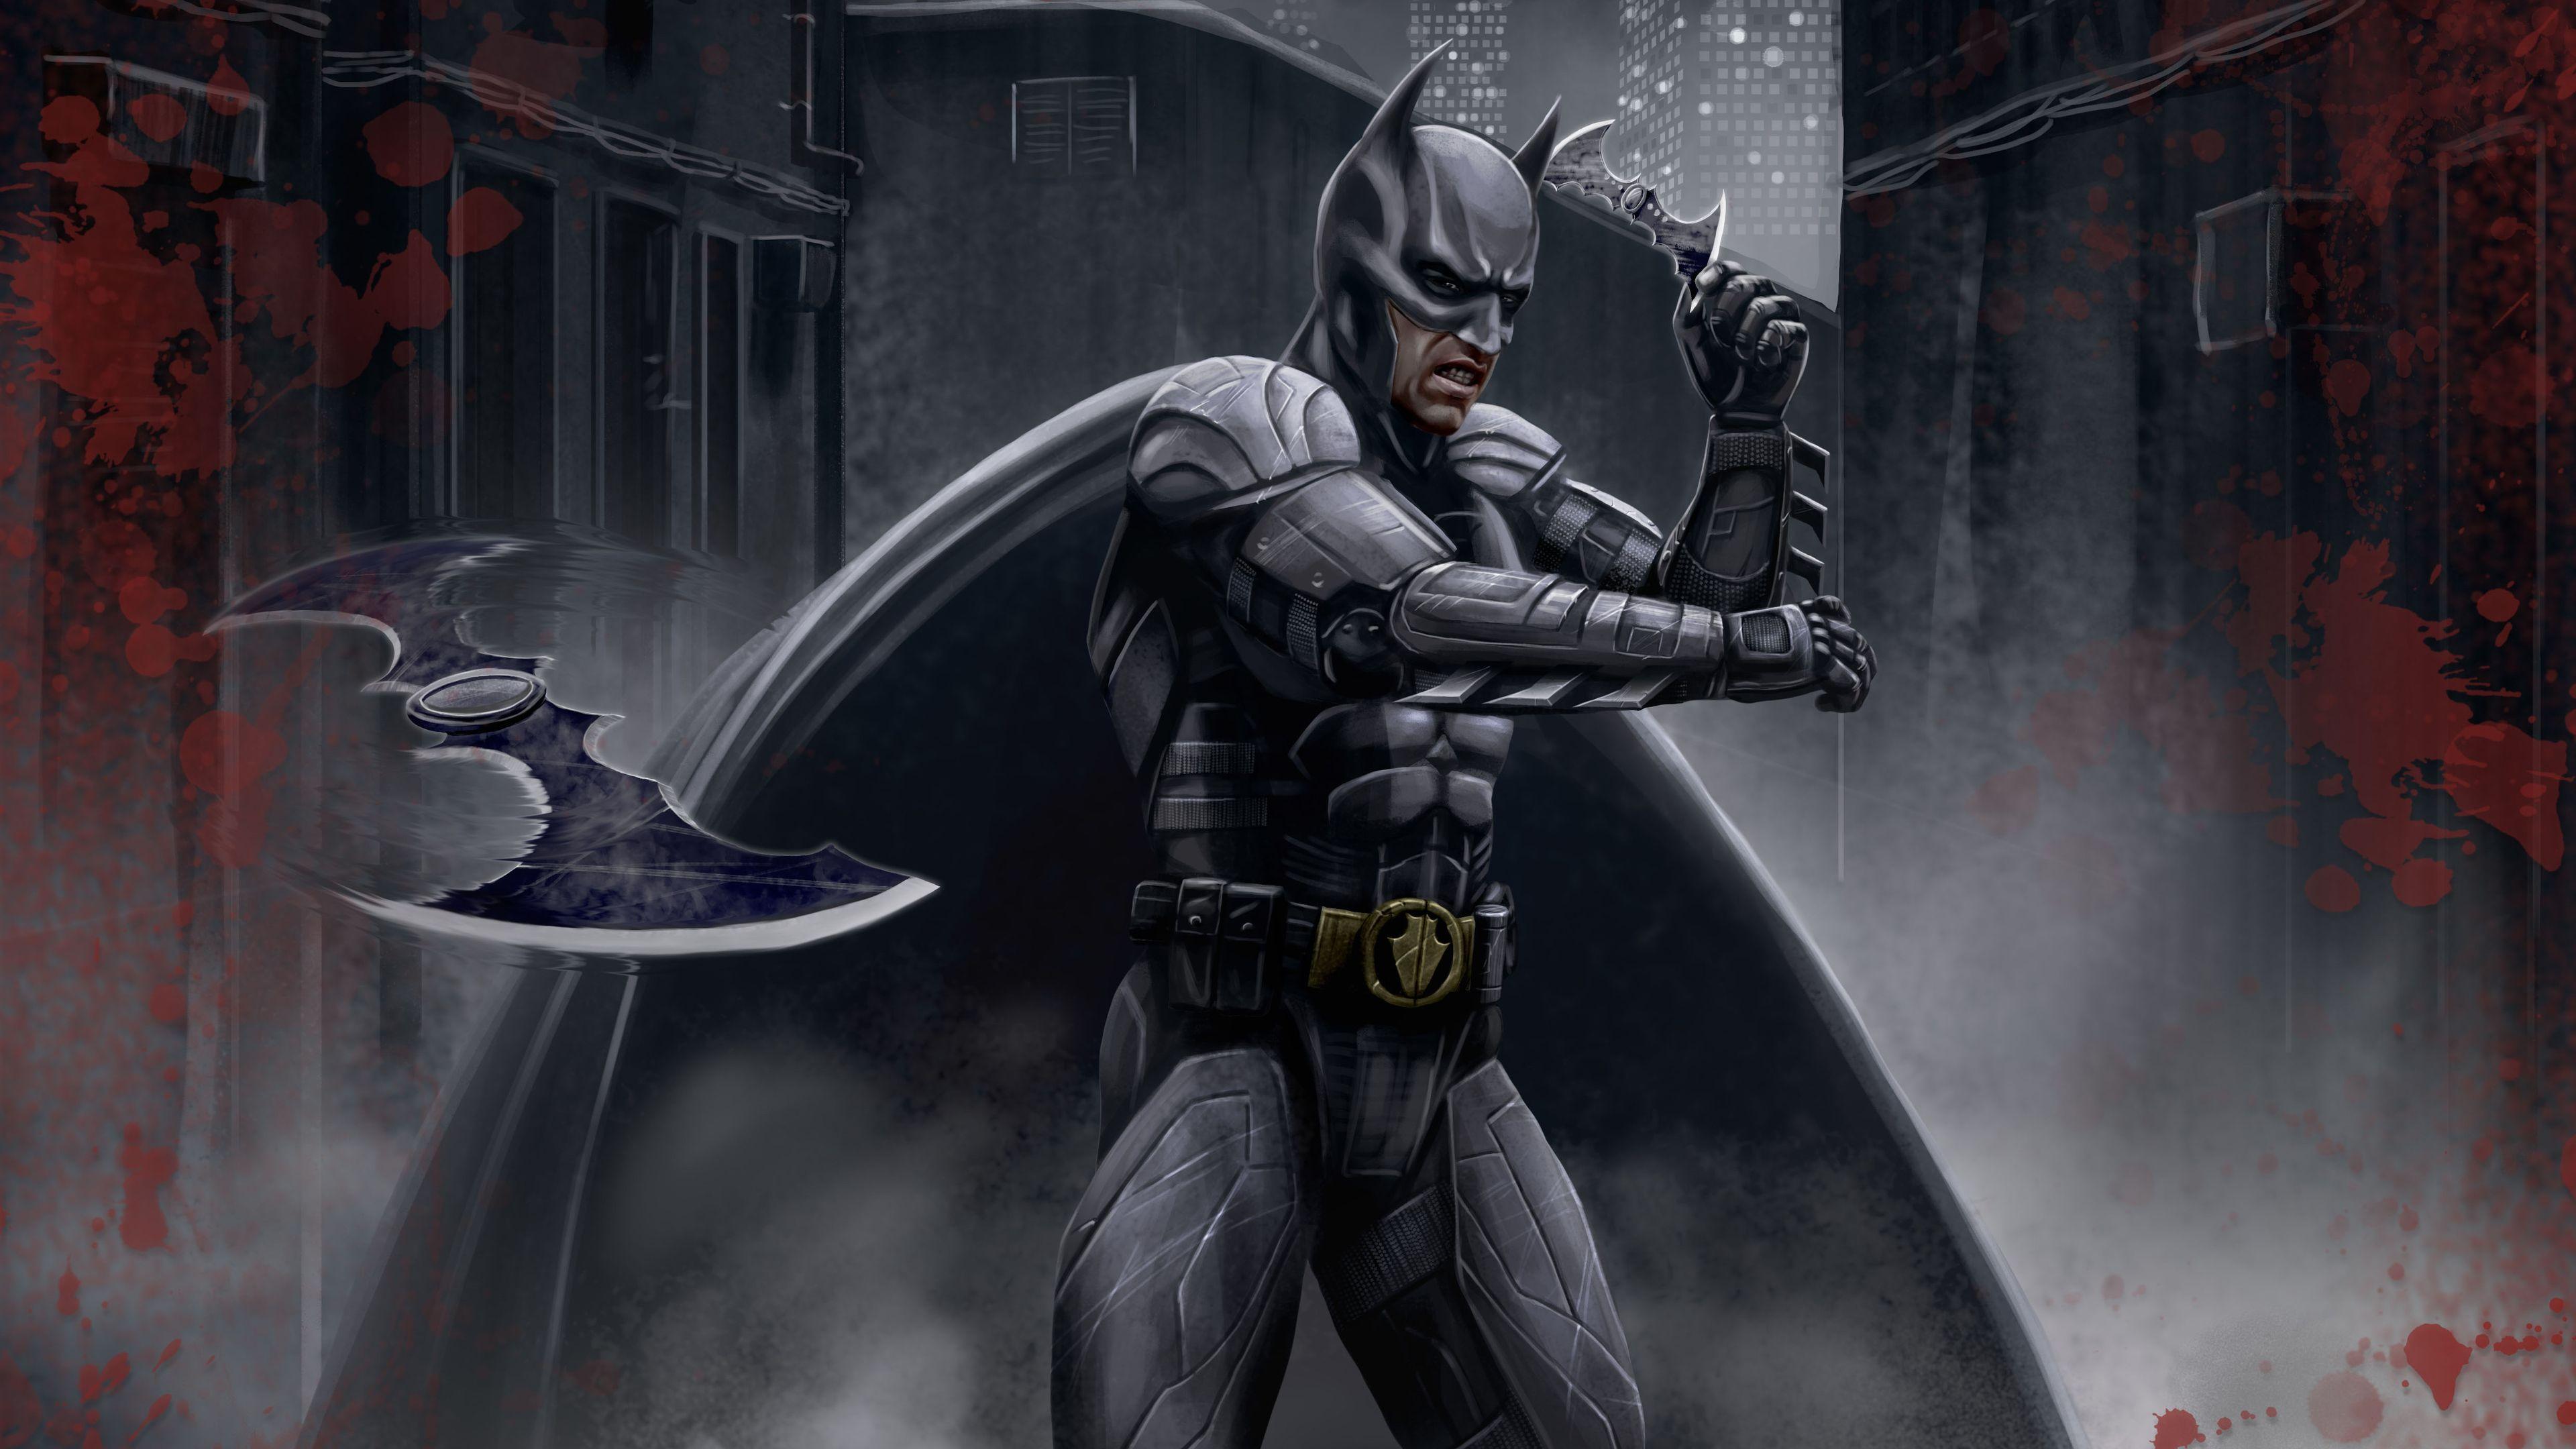 Batman Art 4k Superheroes Wallpapers Hd Wallpapers Digital Art Wallpapers Deviantart Wallpapers Batman Wallpapers Ar Batman Wallpaper Art Wallpaper Batman